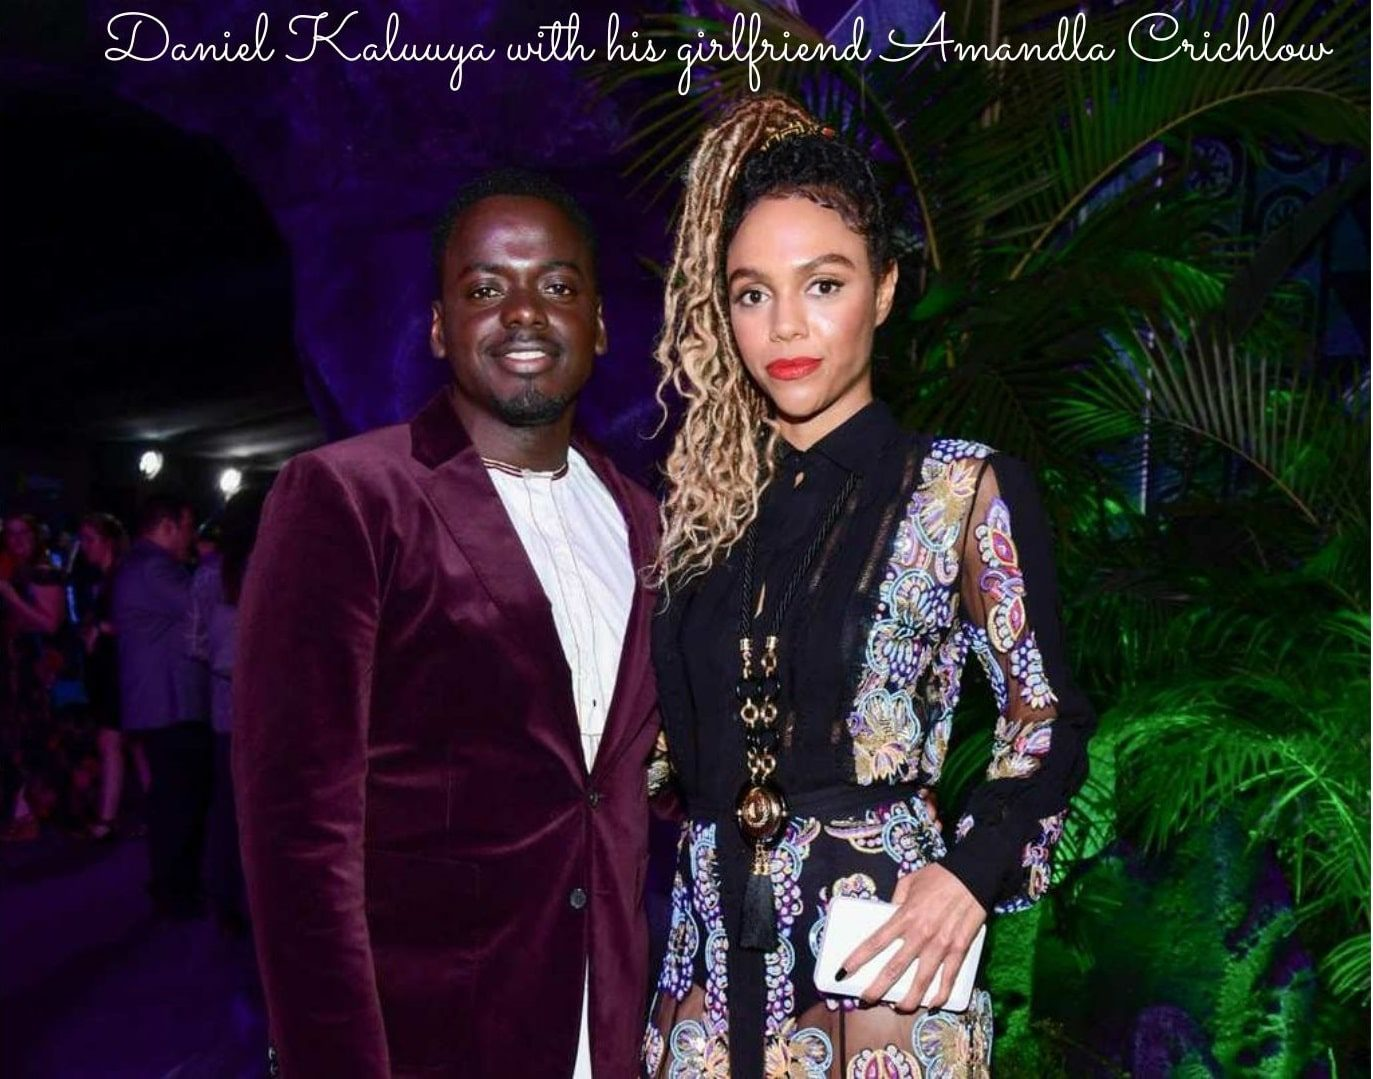 Daniel Kaluuya and Amandla Crichlow